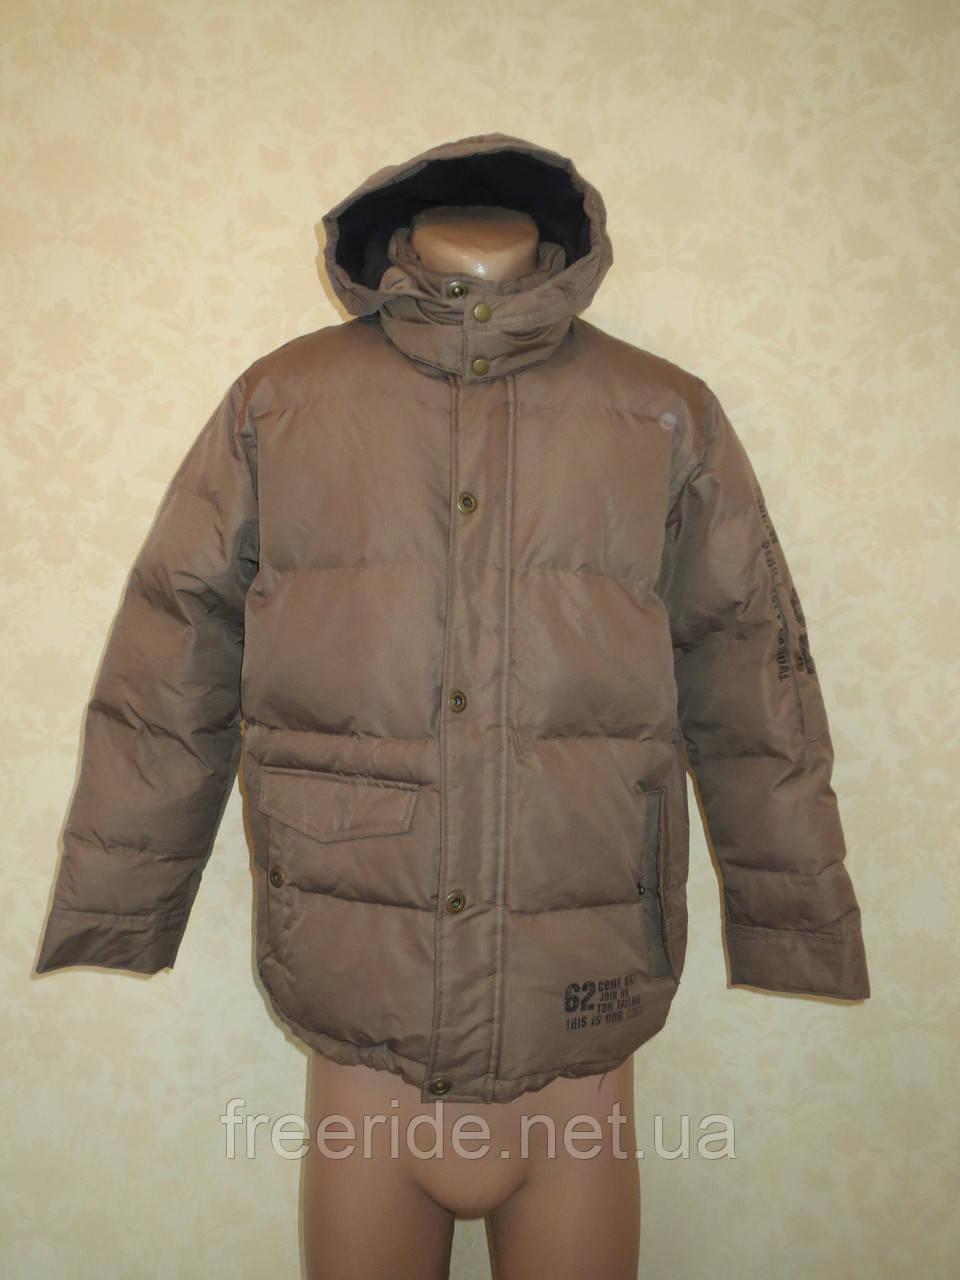 Зимняя куртка Tom Tailor (L) Reflective  УЦЕНКА!